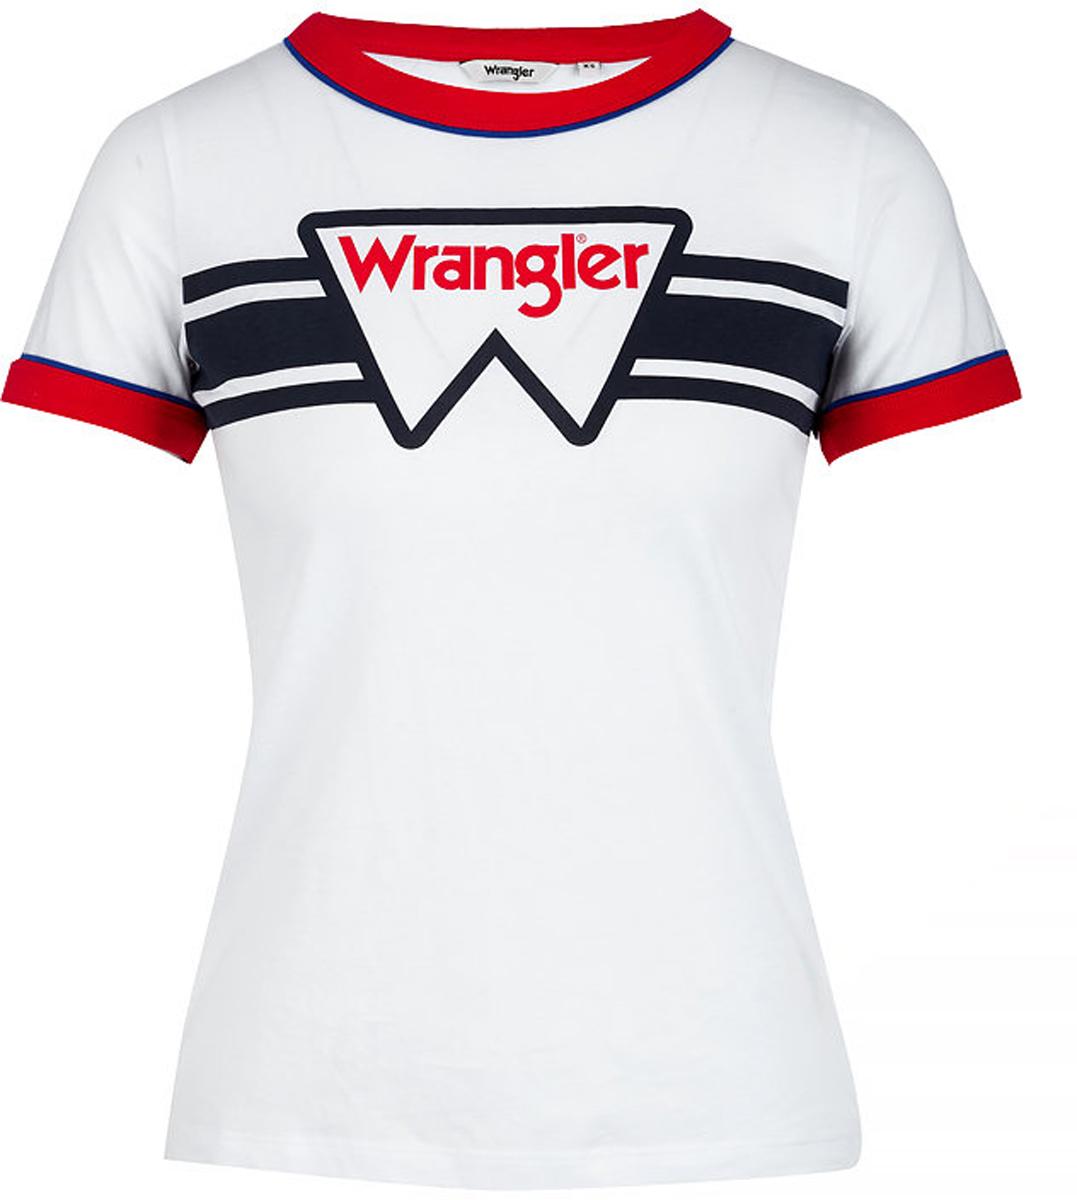 Футболка женская Wrangler, цвет: белый. W710SEV12. Размер S (42)W710SEV12